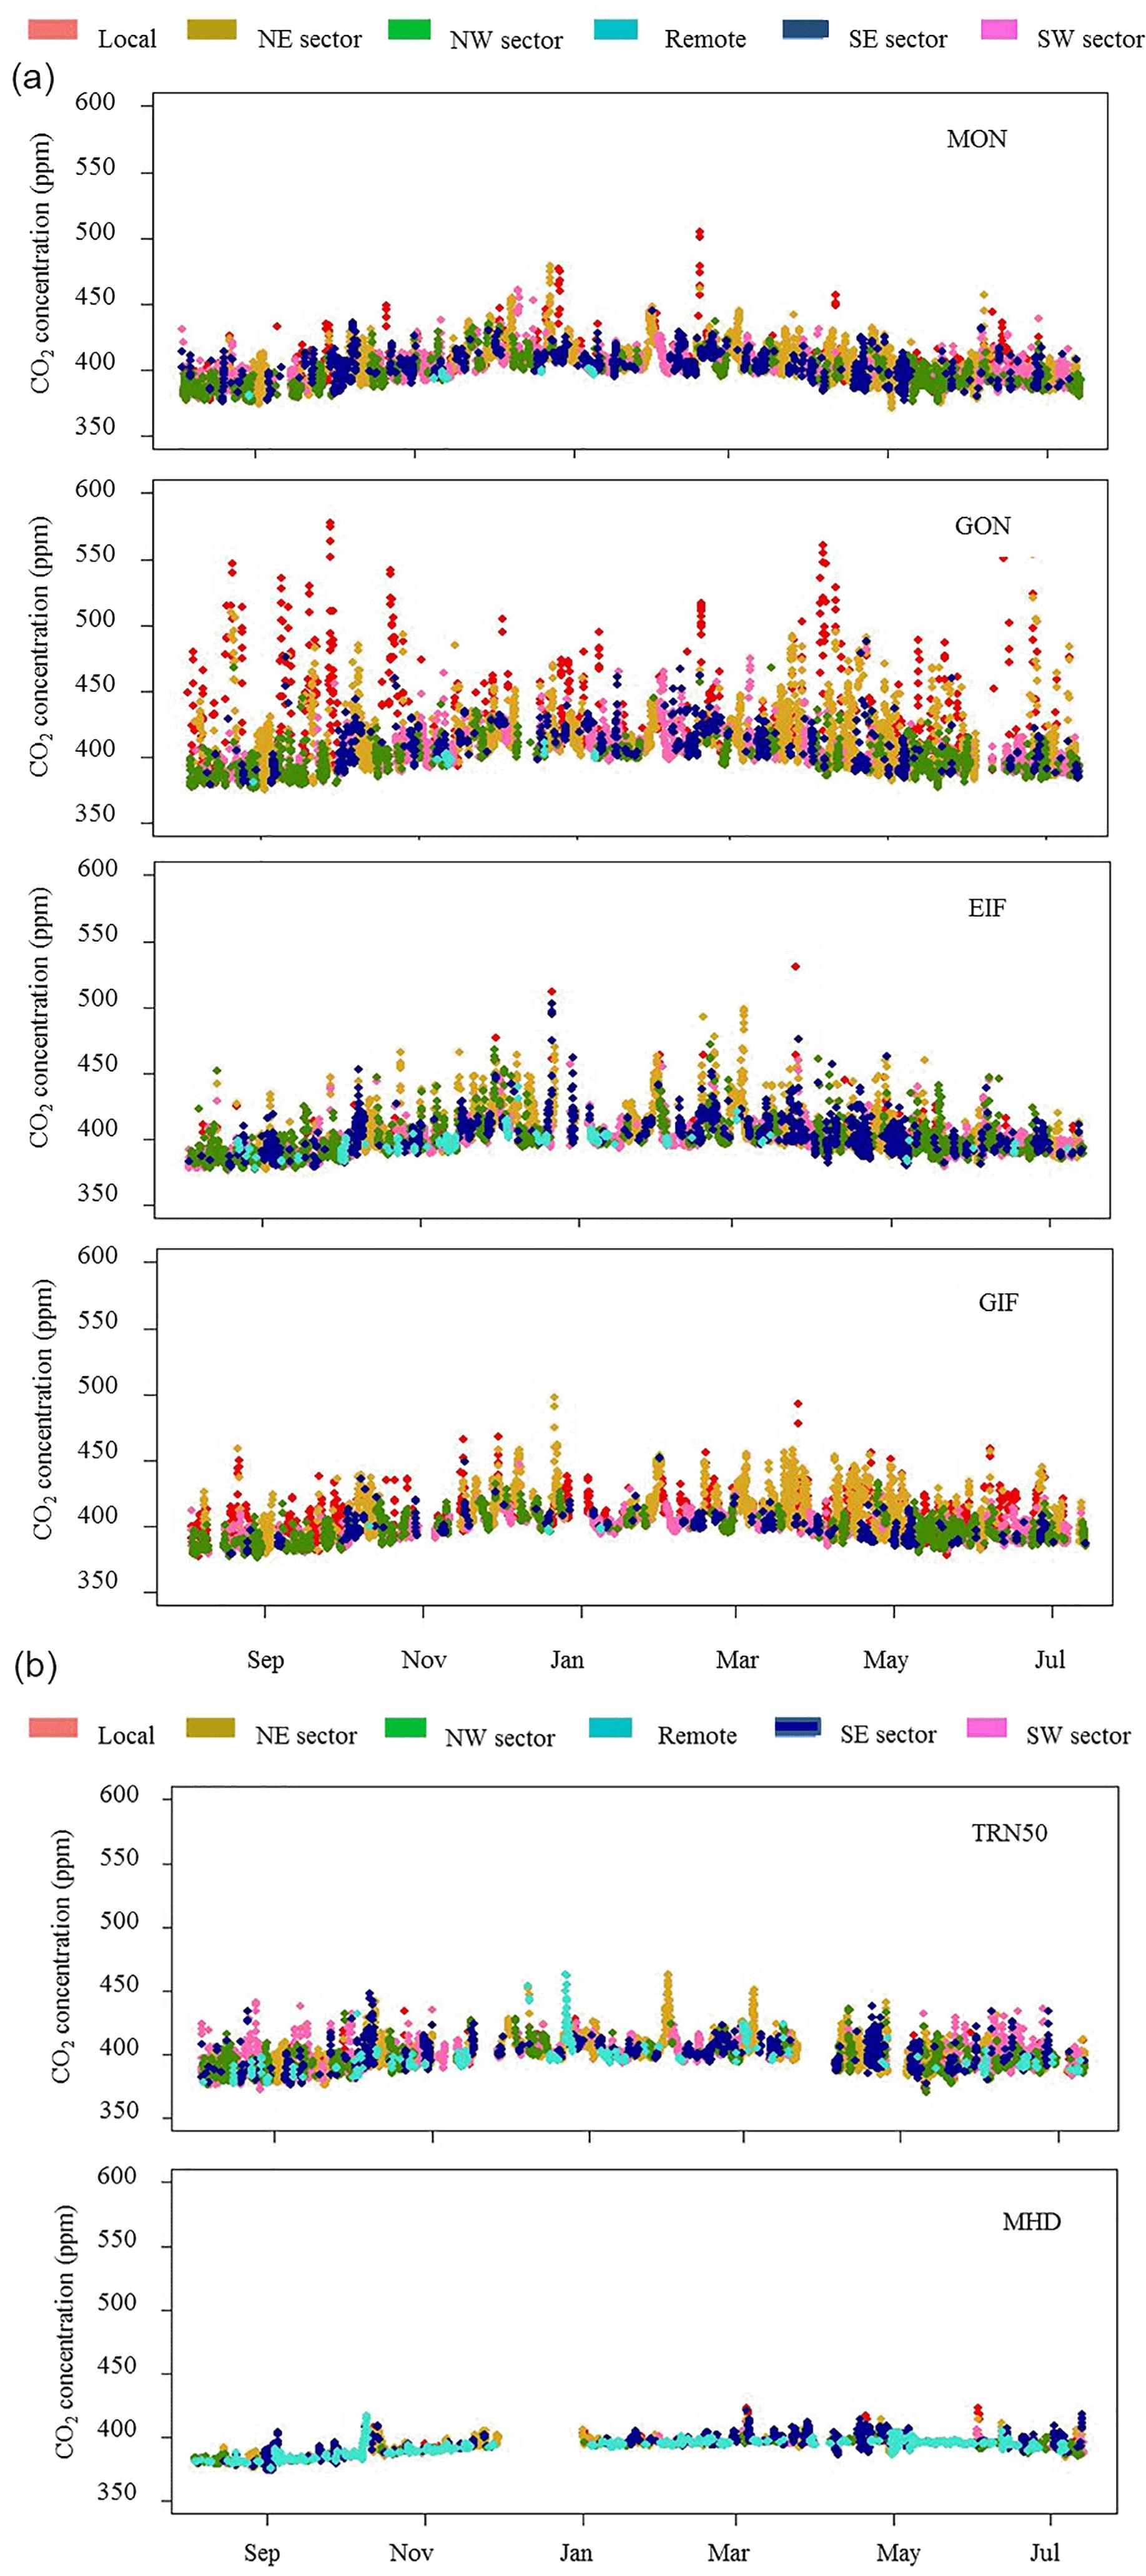 ACP - Diurnal, synoptic and seasonal variability of